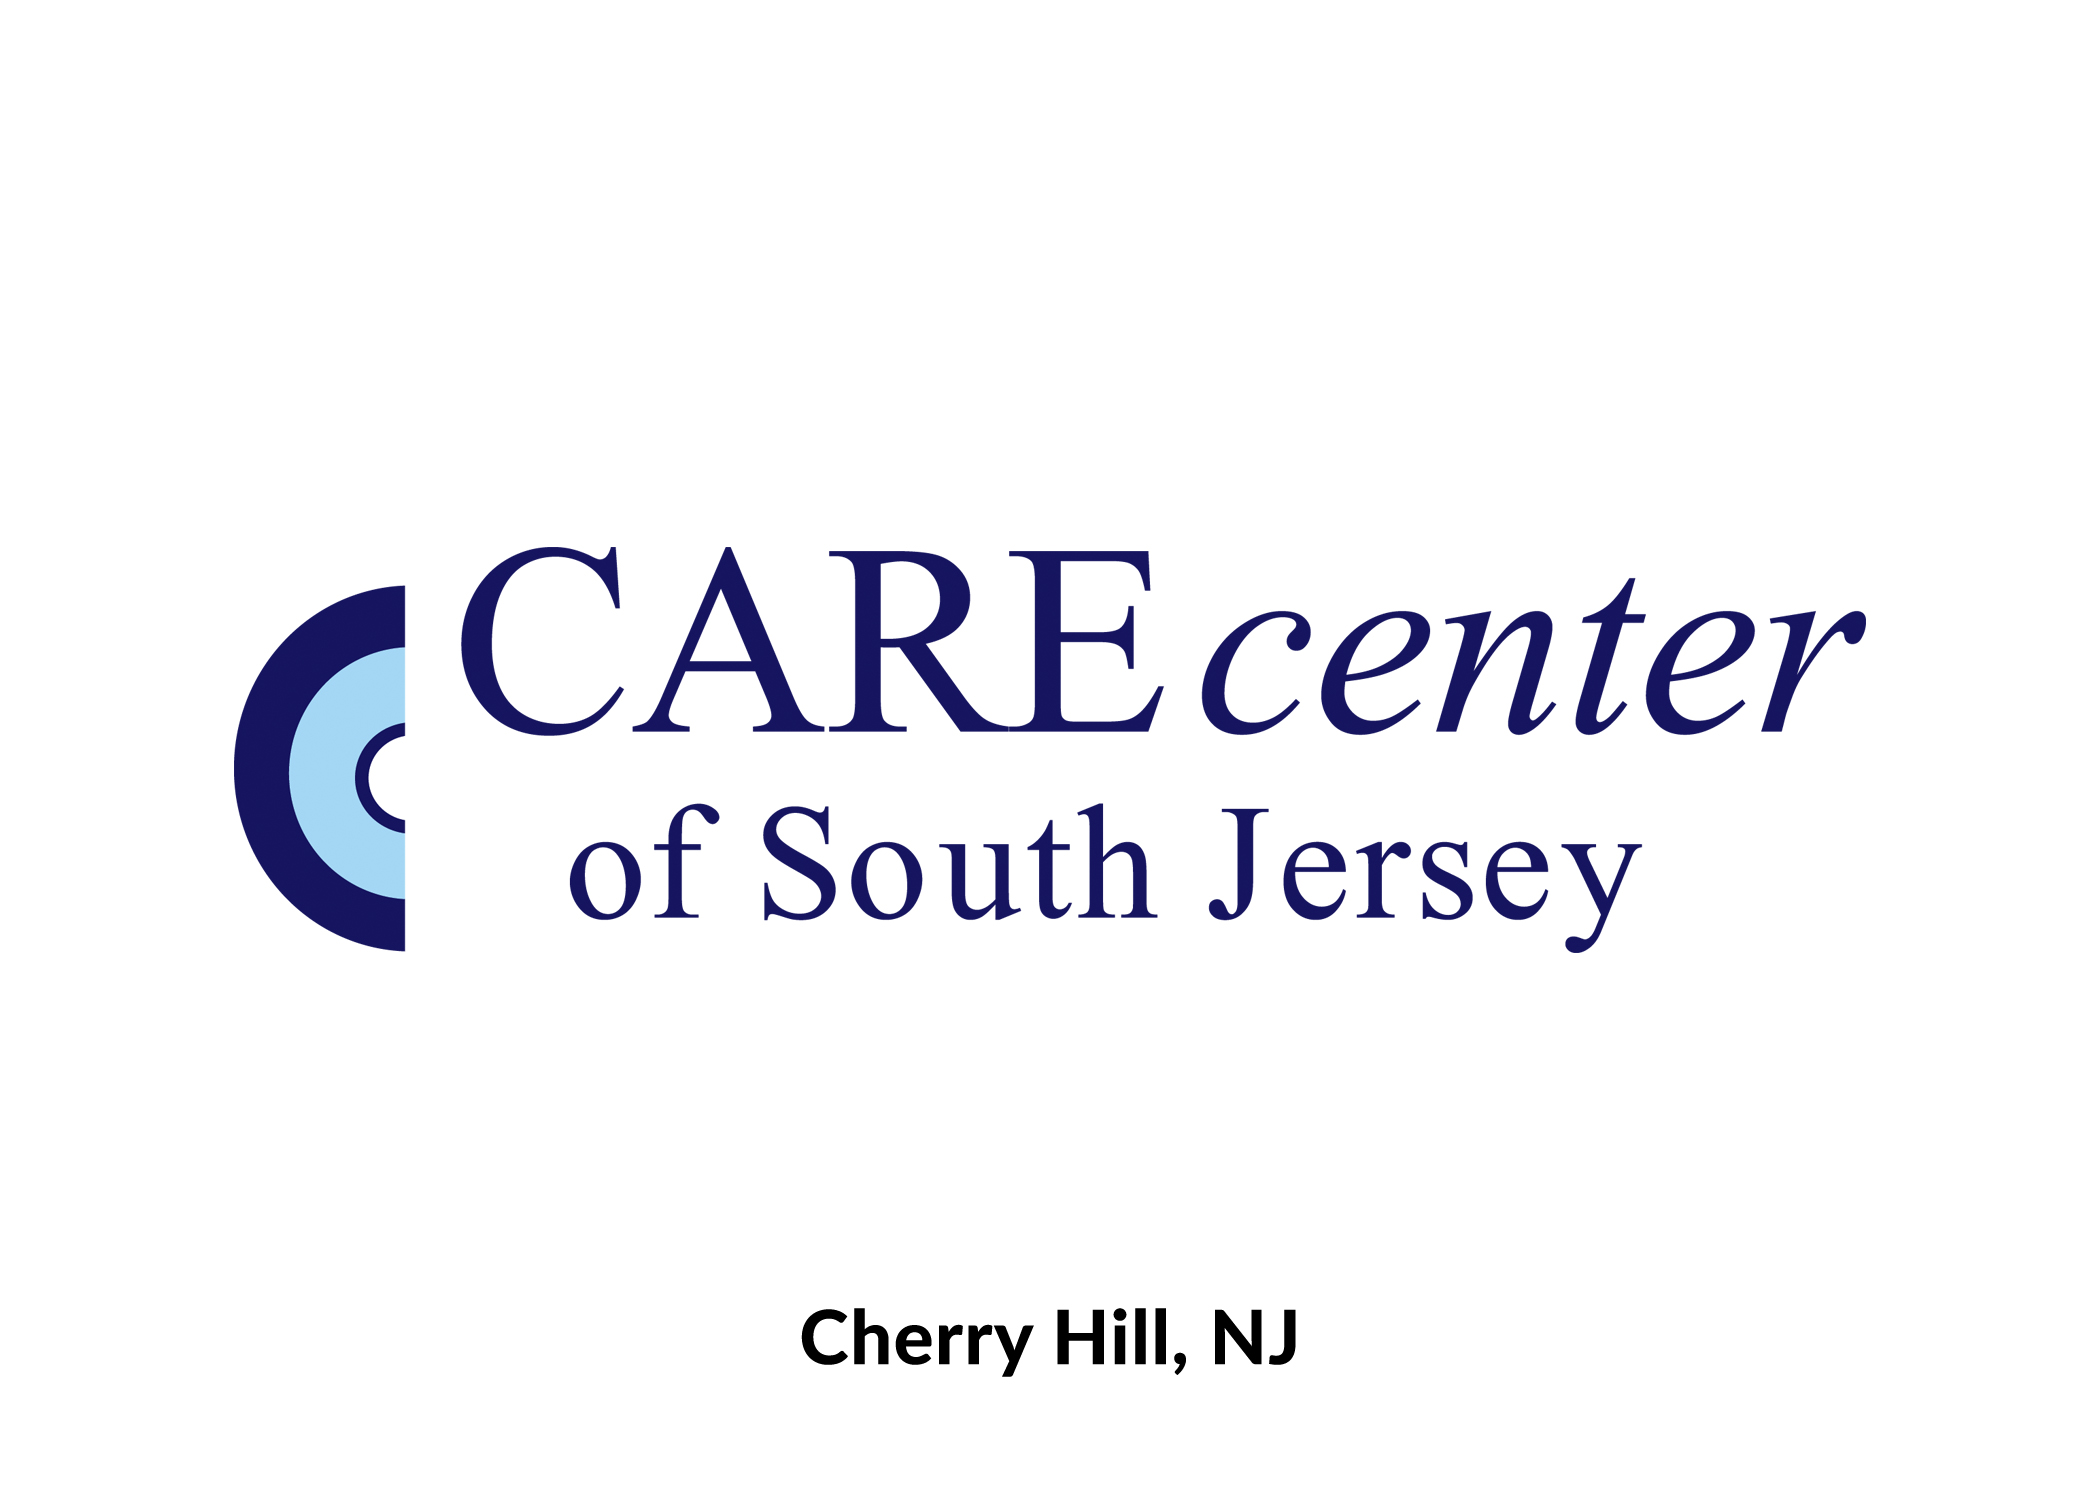 CAREcenterSJ_allcore_logo.jpg